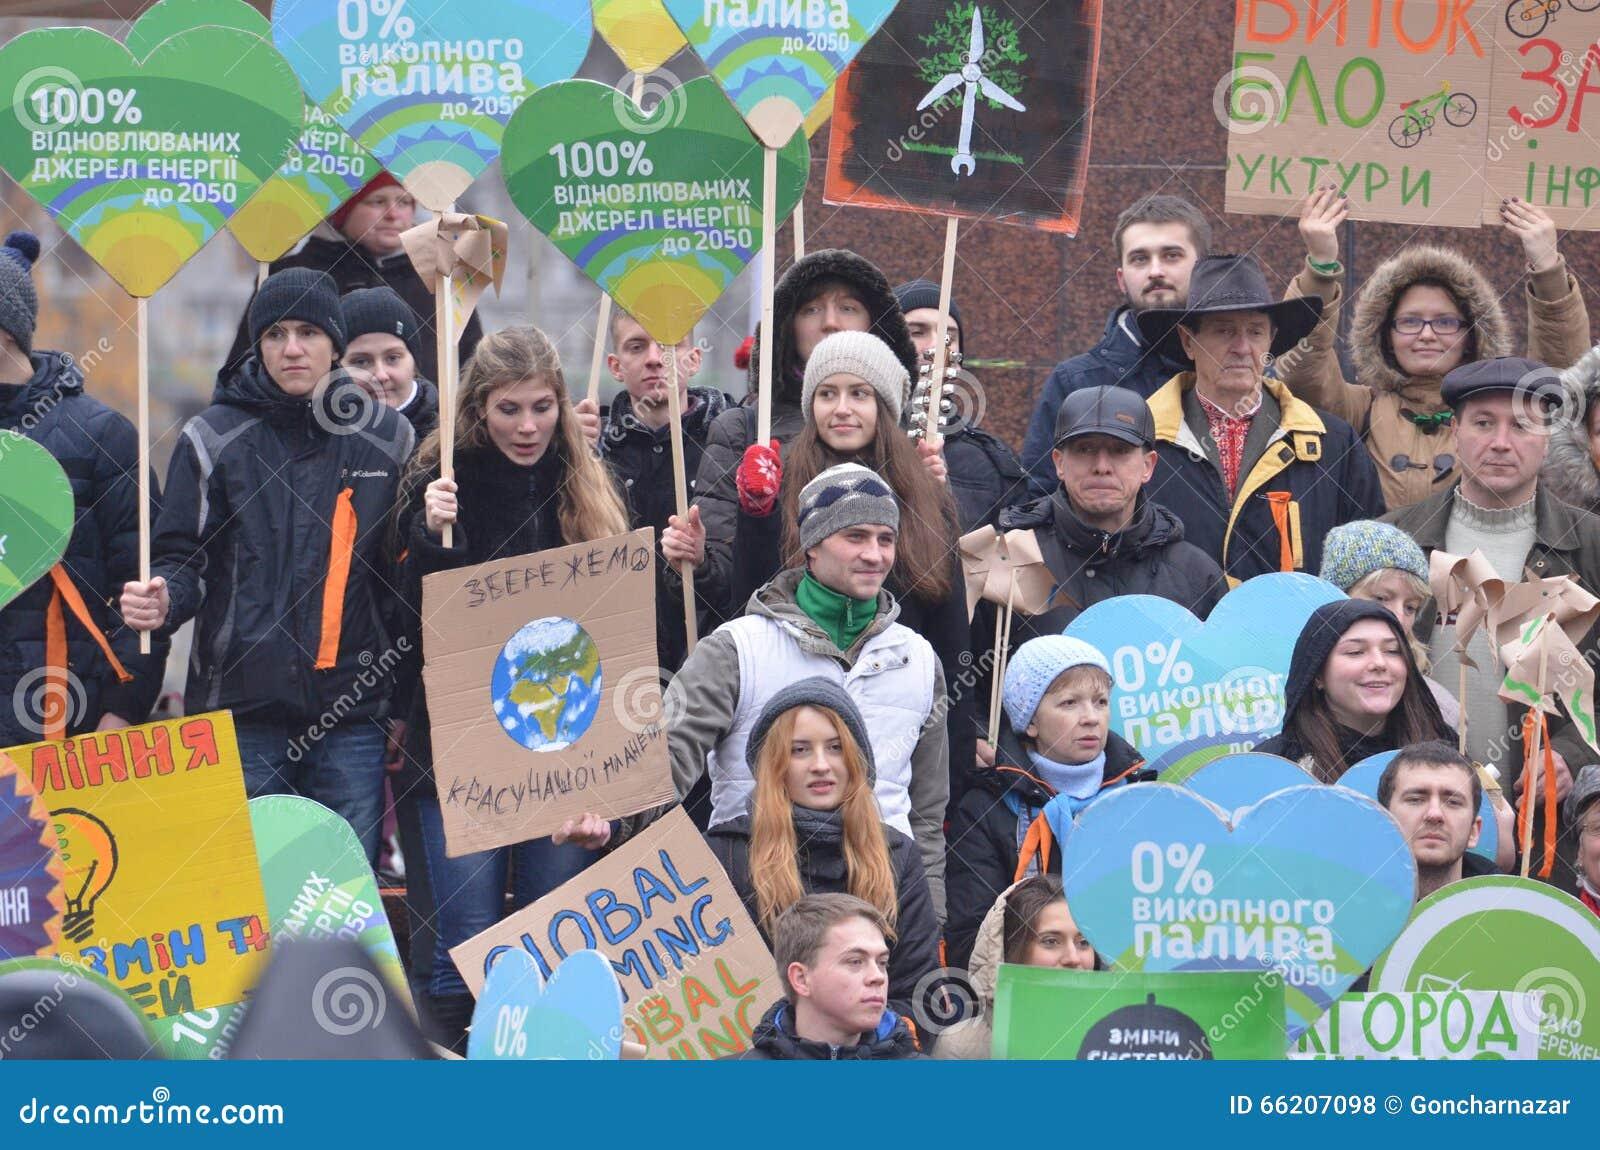 KIEV, de OEKRAÏNE - 29 Nov., 2015: Oekraïeners spelen een rol in het Oekraïense Globale Klimaat Maart